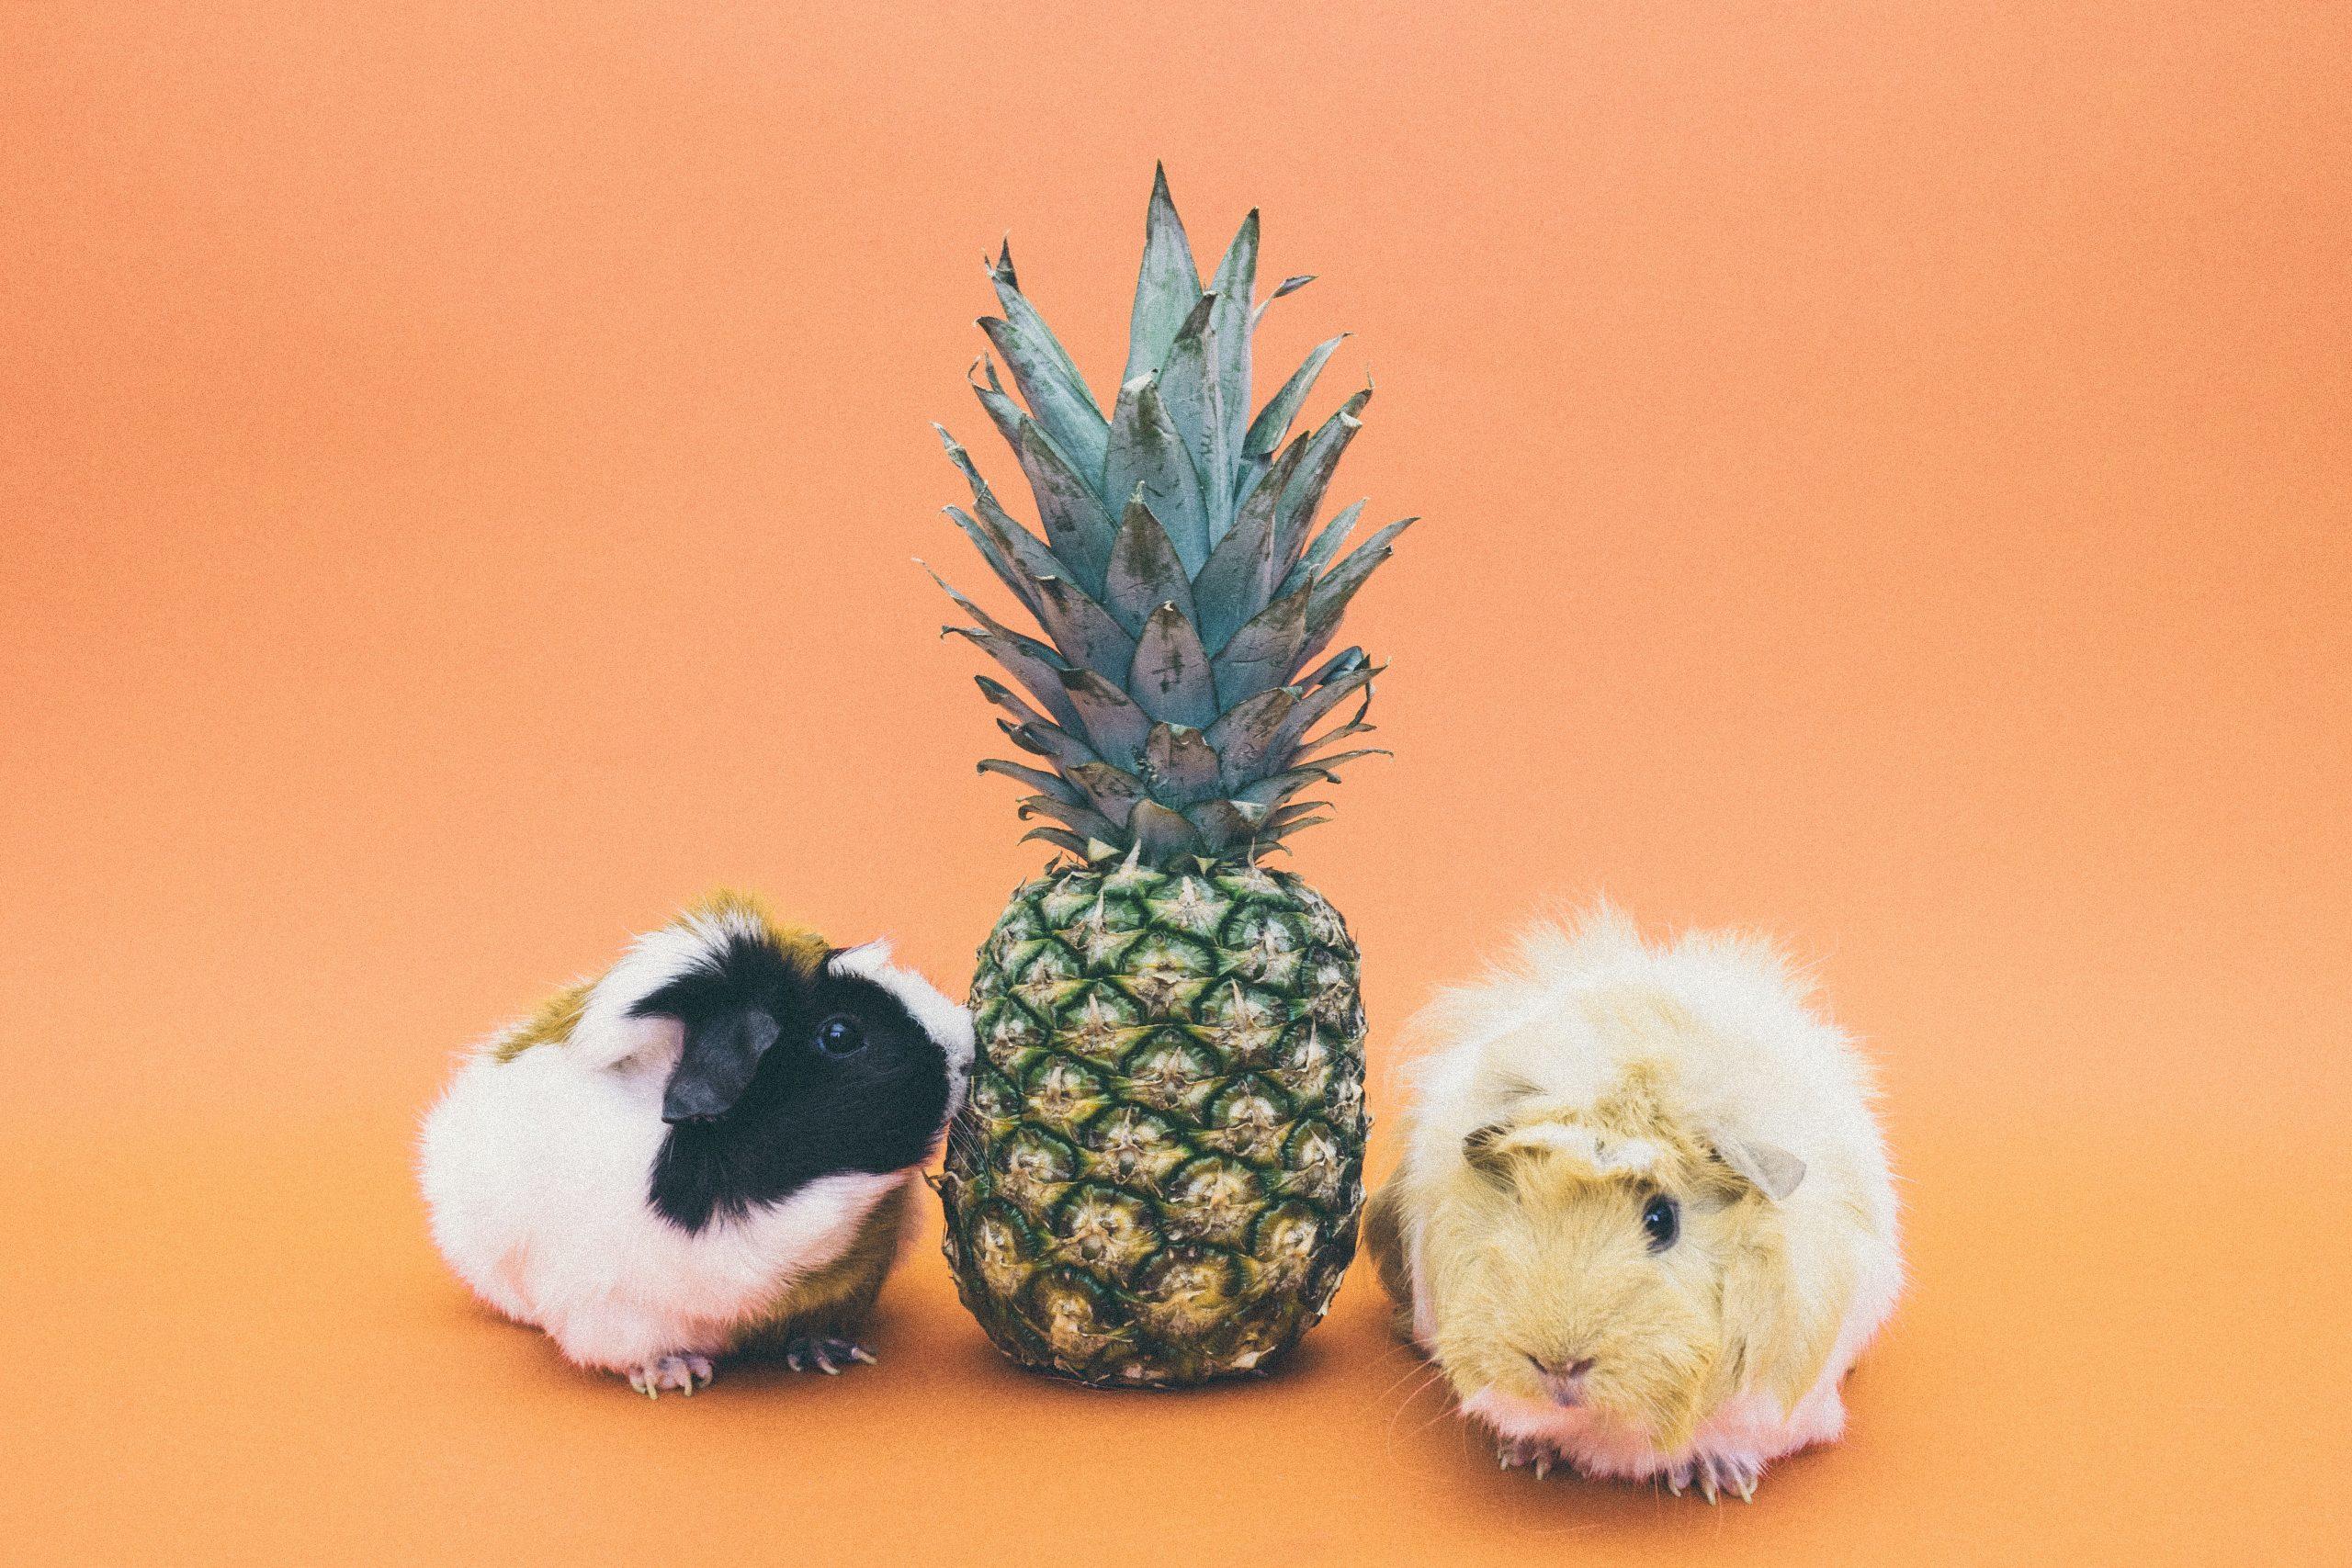 pexels-pineapple-supply-co-174667 (1)